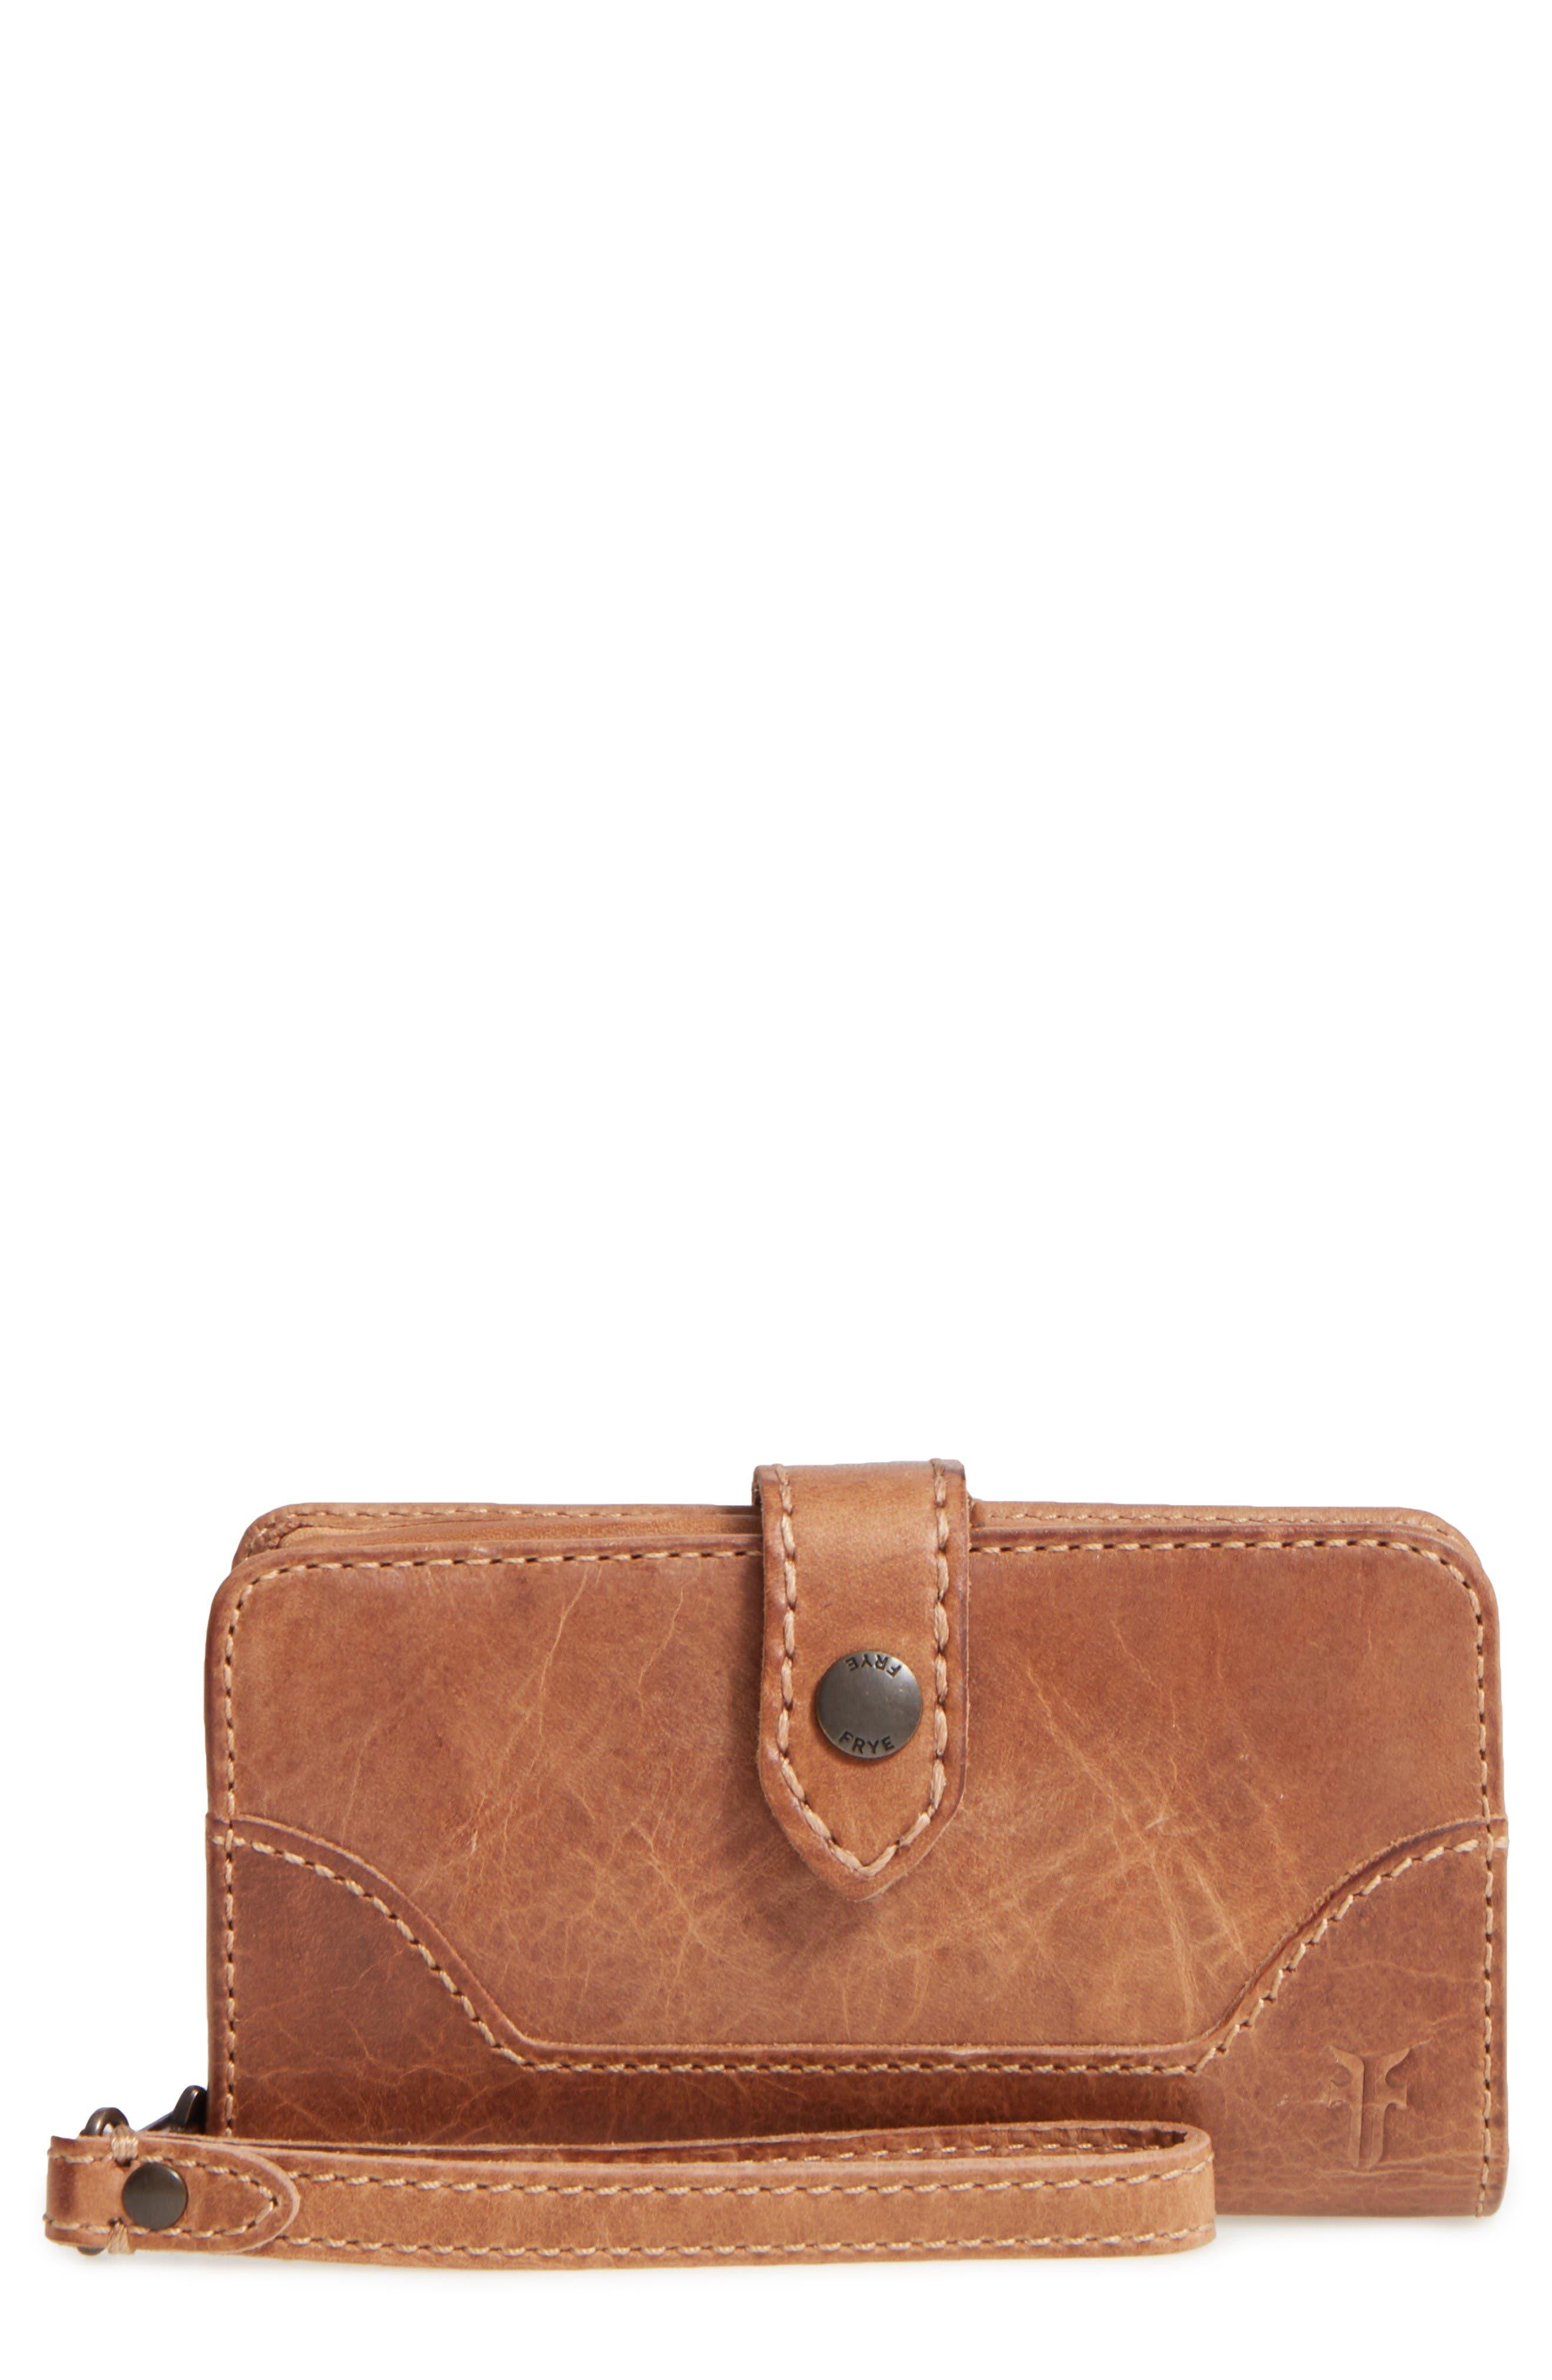 Main Image - Frye 'Melissa' Leather Phone Wallet